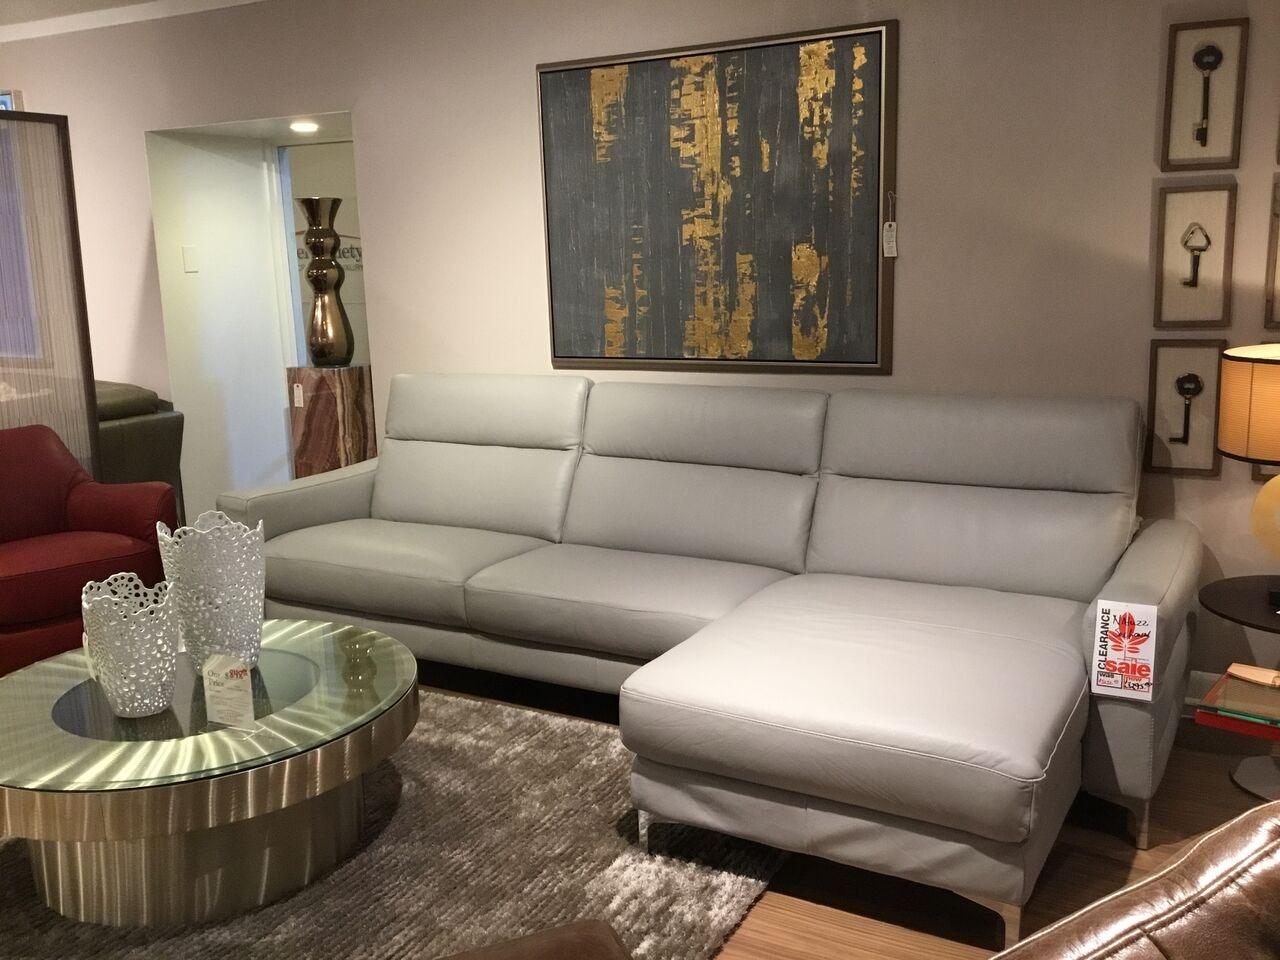 Sofas natuzzi outlet madrid refil sofa for Sofas madrid outlet